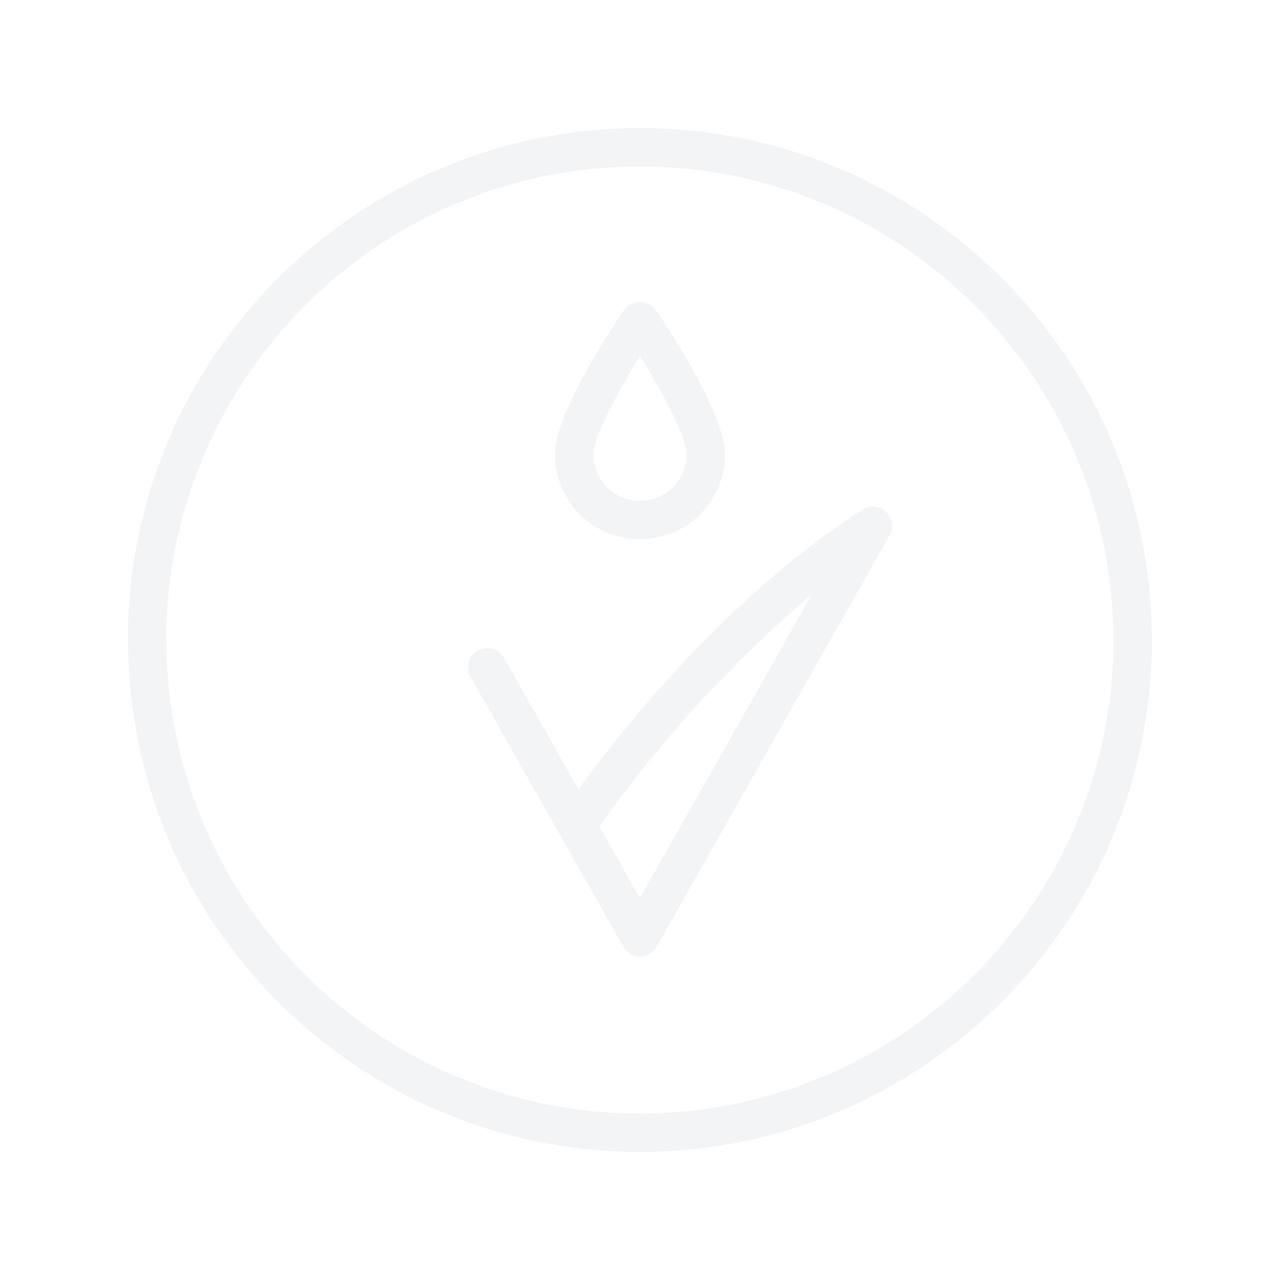 Collistar Body Multi-Active Deodorant 24 Hours Hyper-sensitive skins 100ml